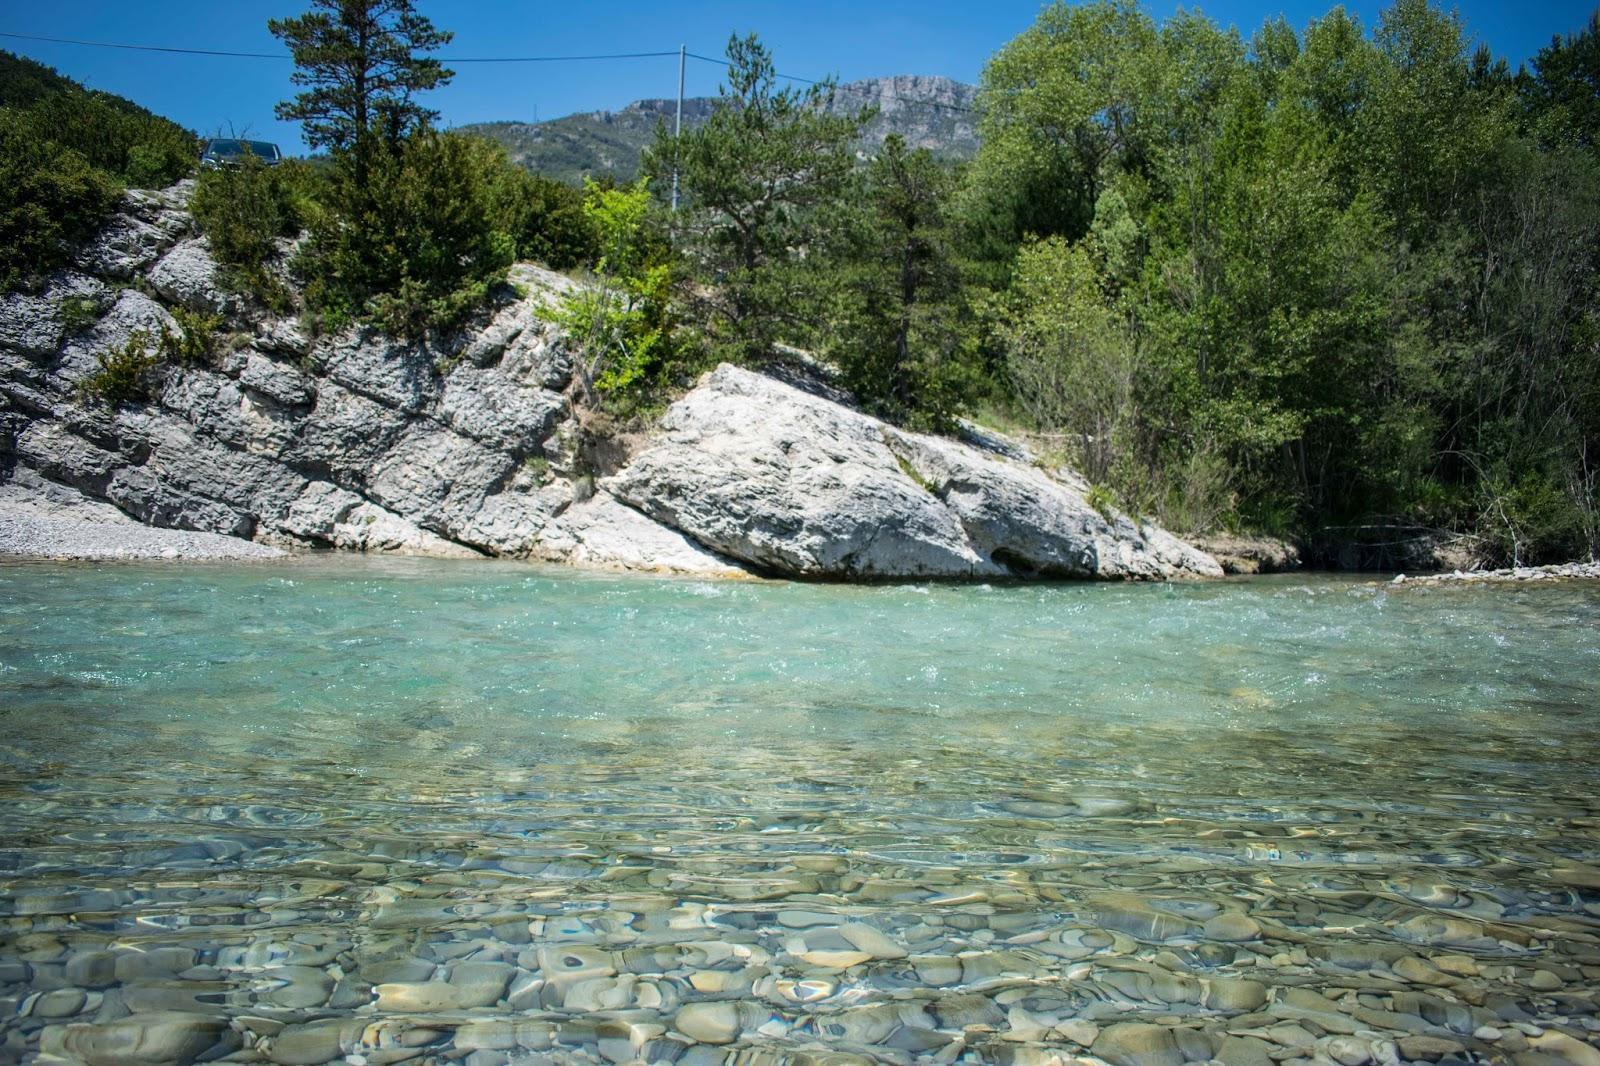 eau turquoise